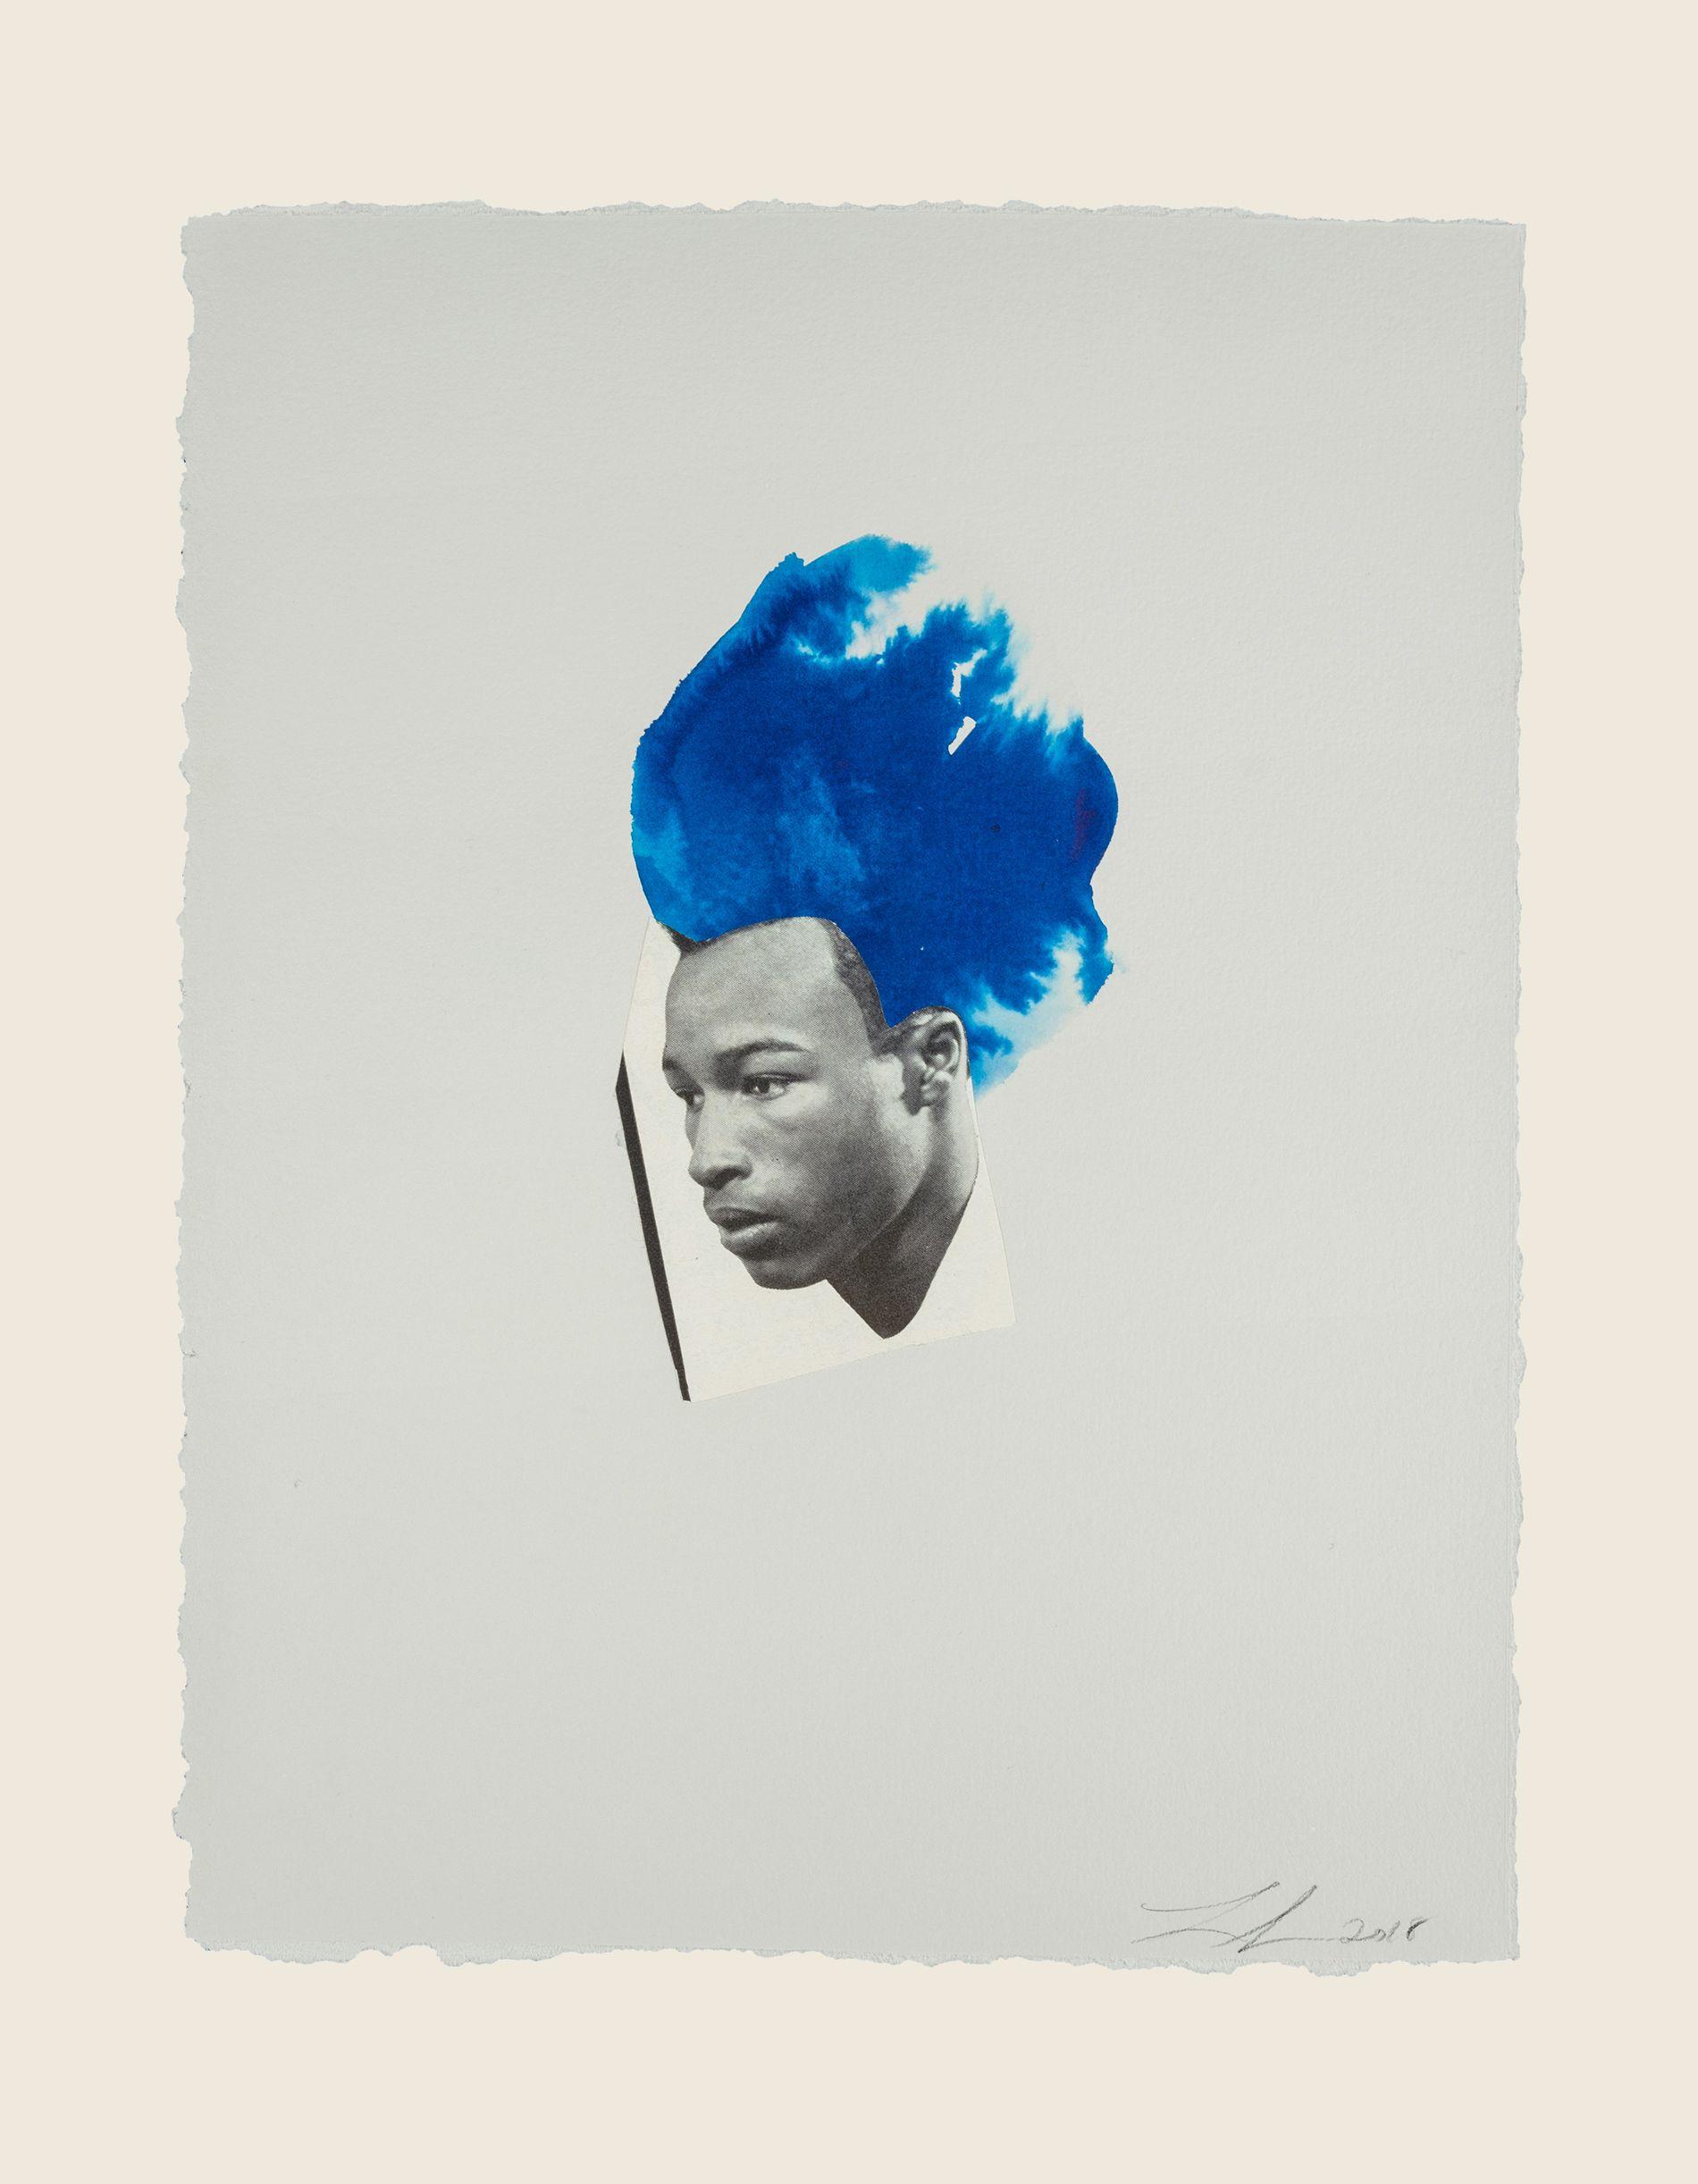 Blue Love, 2018